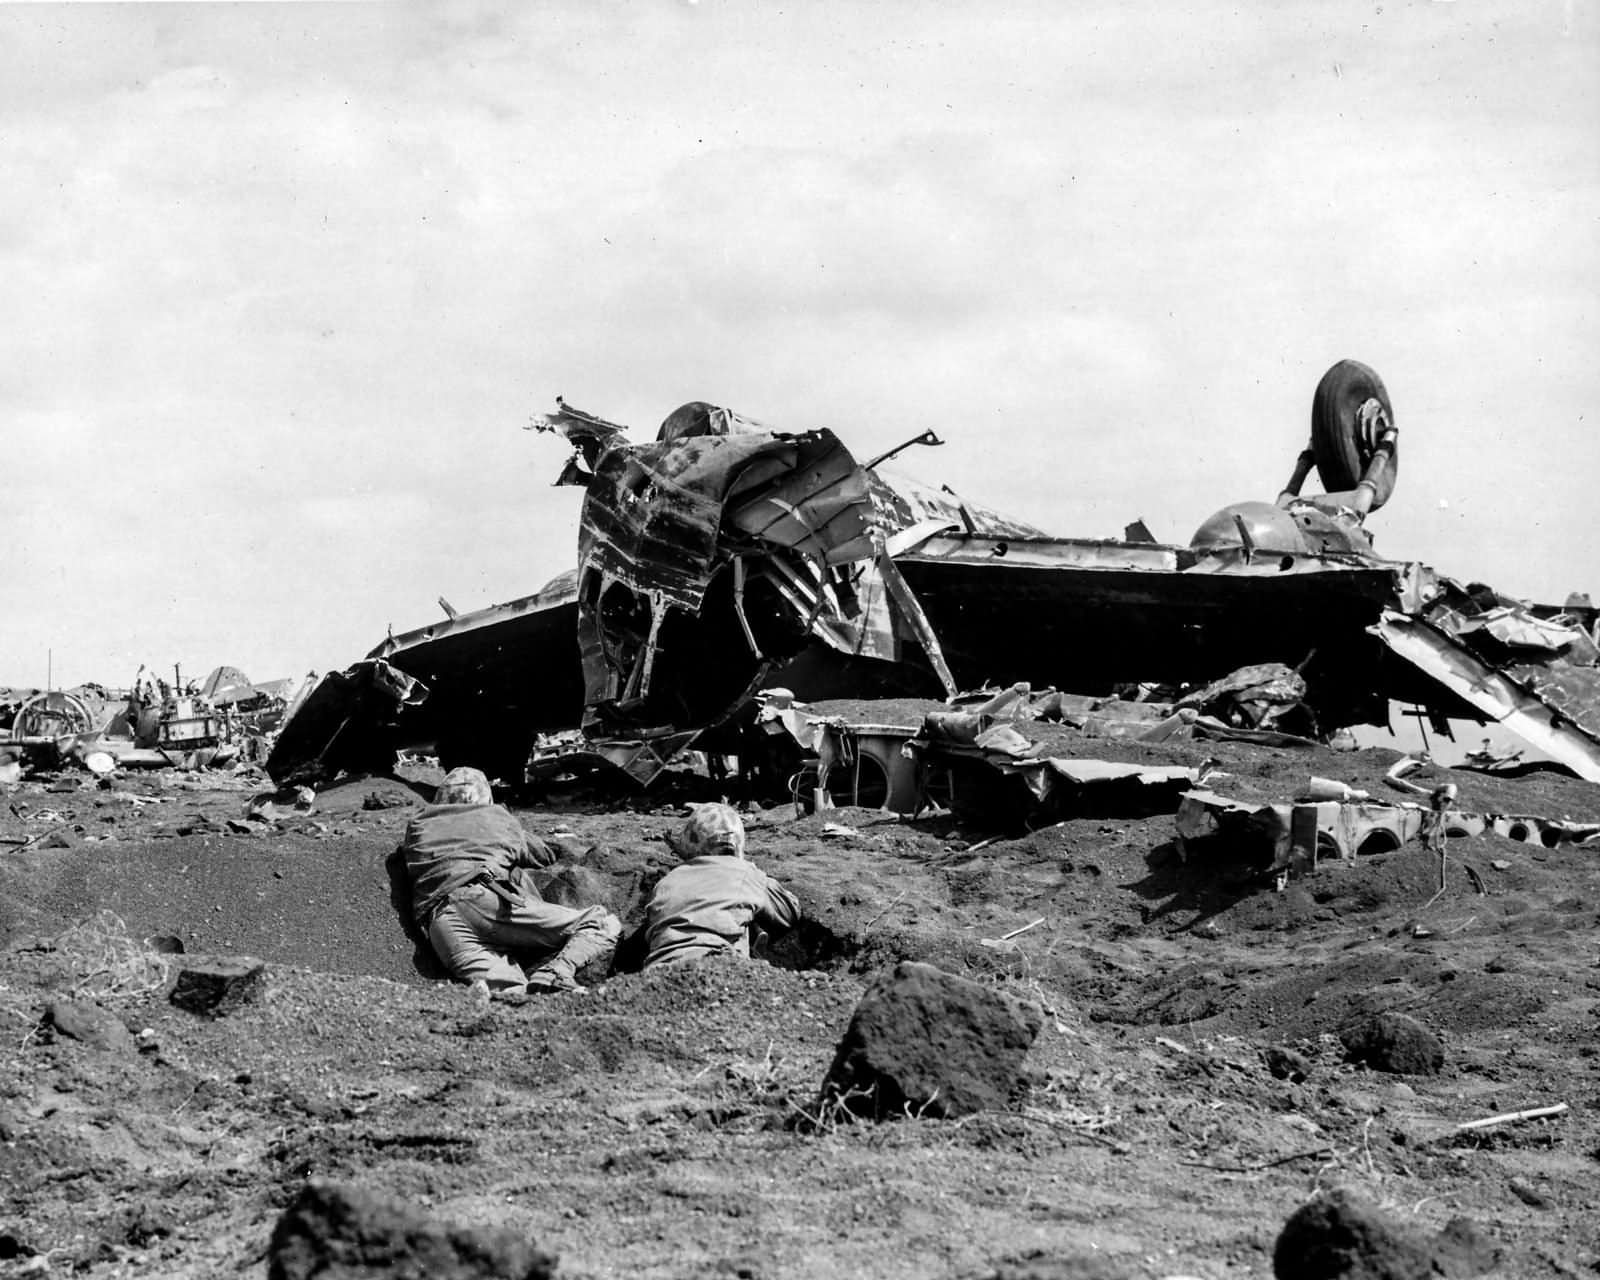 Wrecked_Japanese_aircraft_and_Marines_on_Motoyama_airfield_Iwo_Jima.jpg